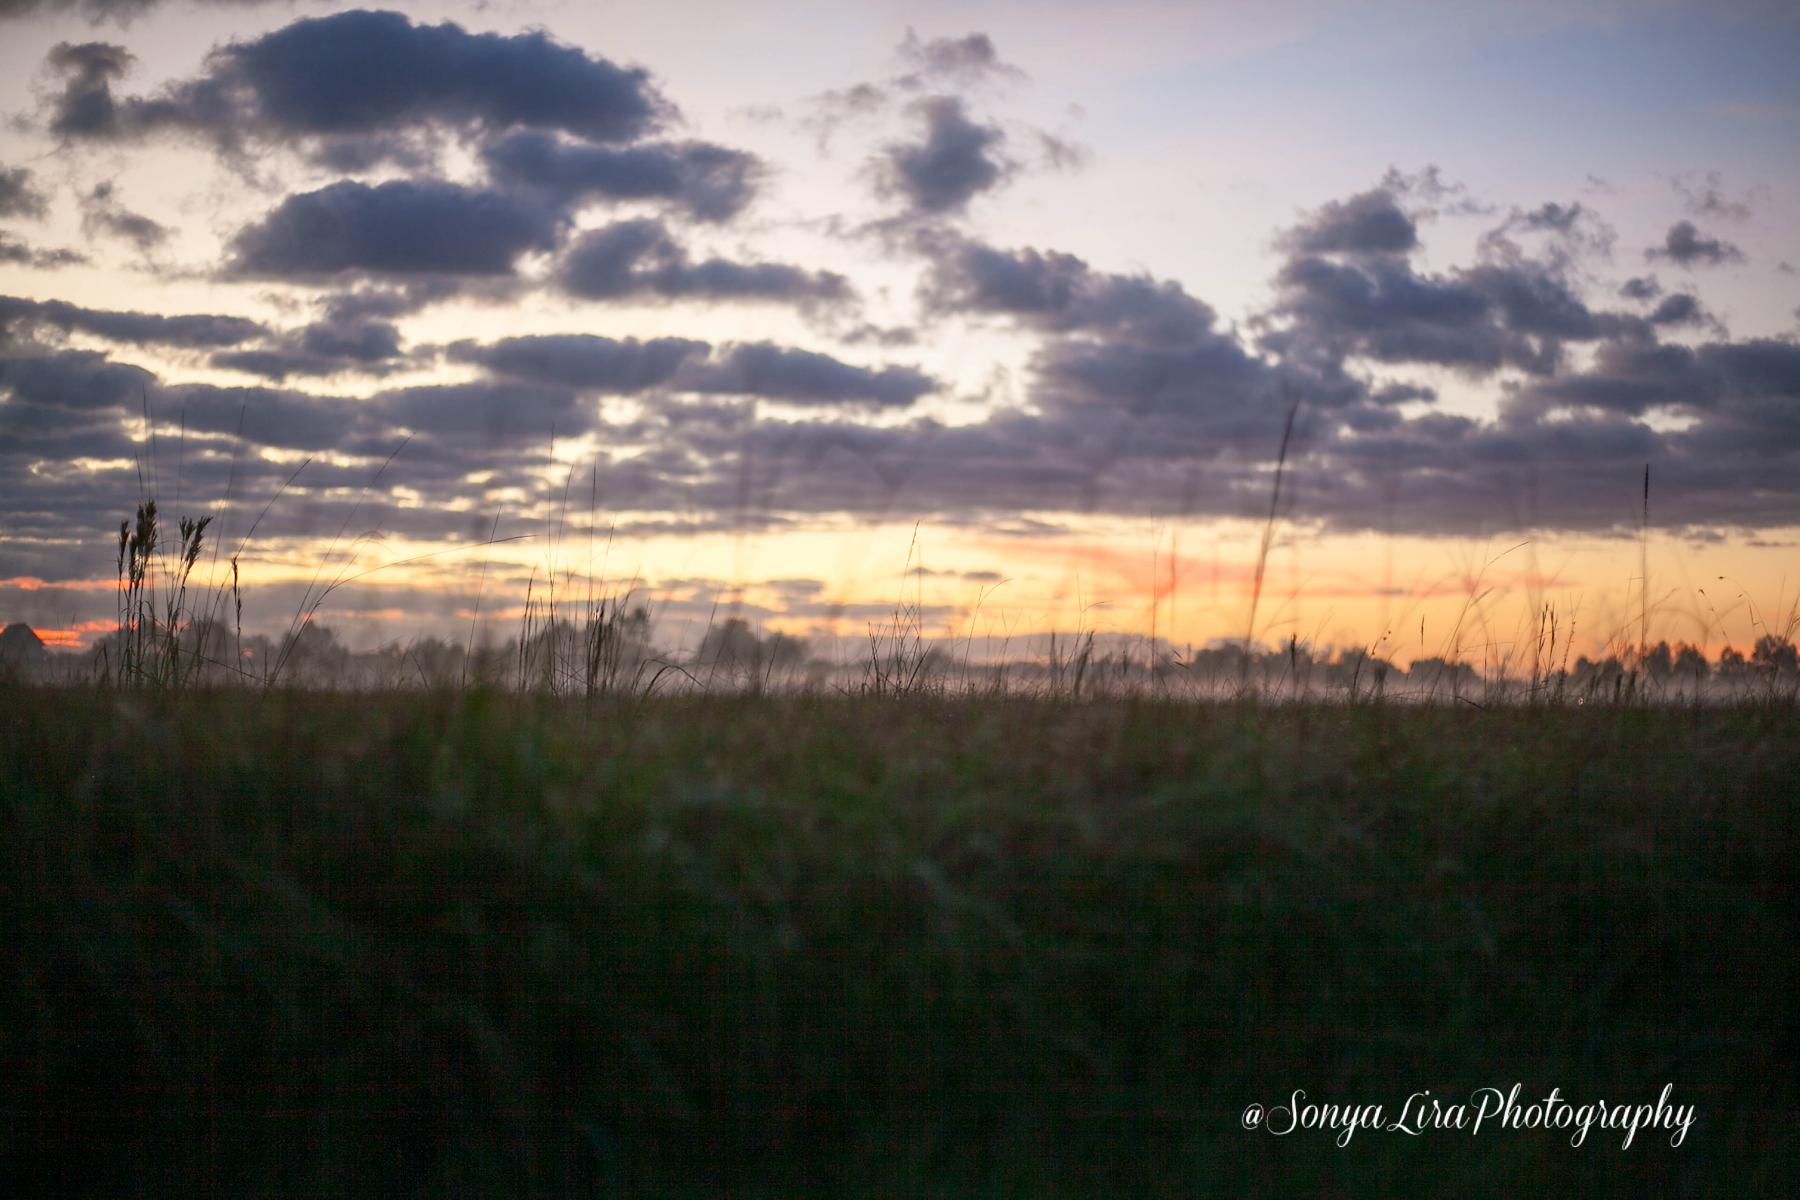 SunriseManvelview1